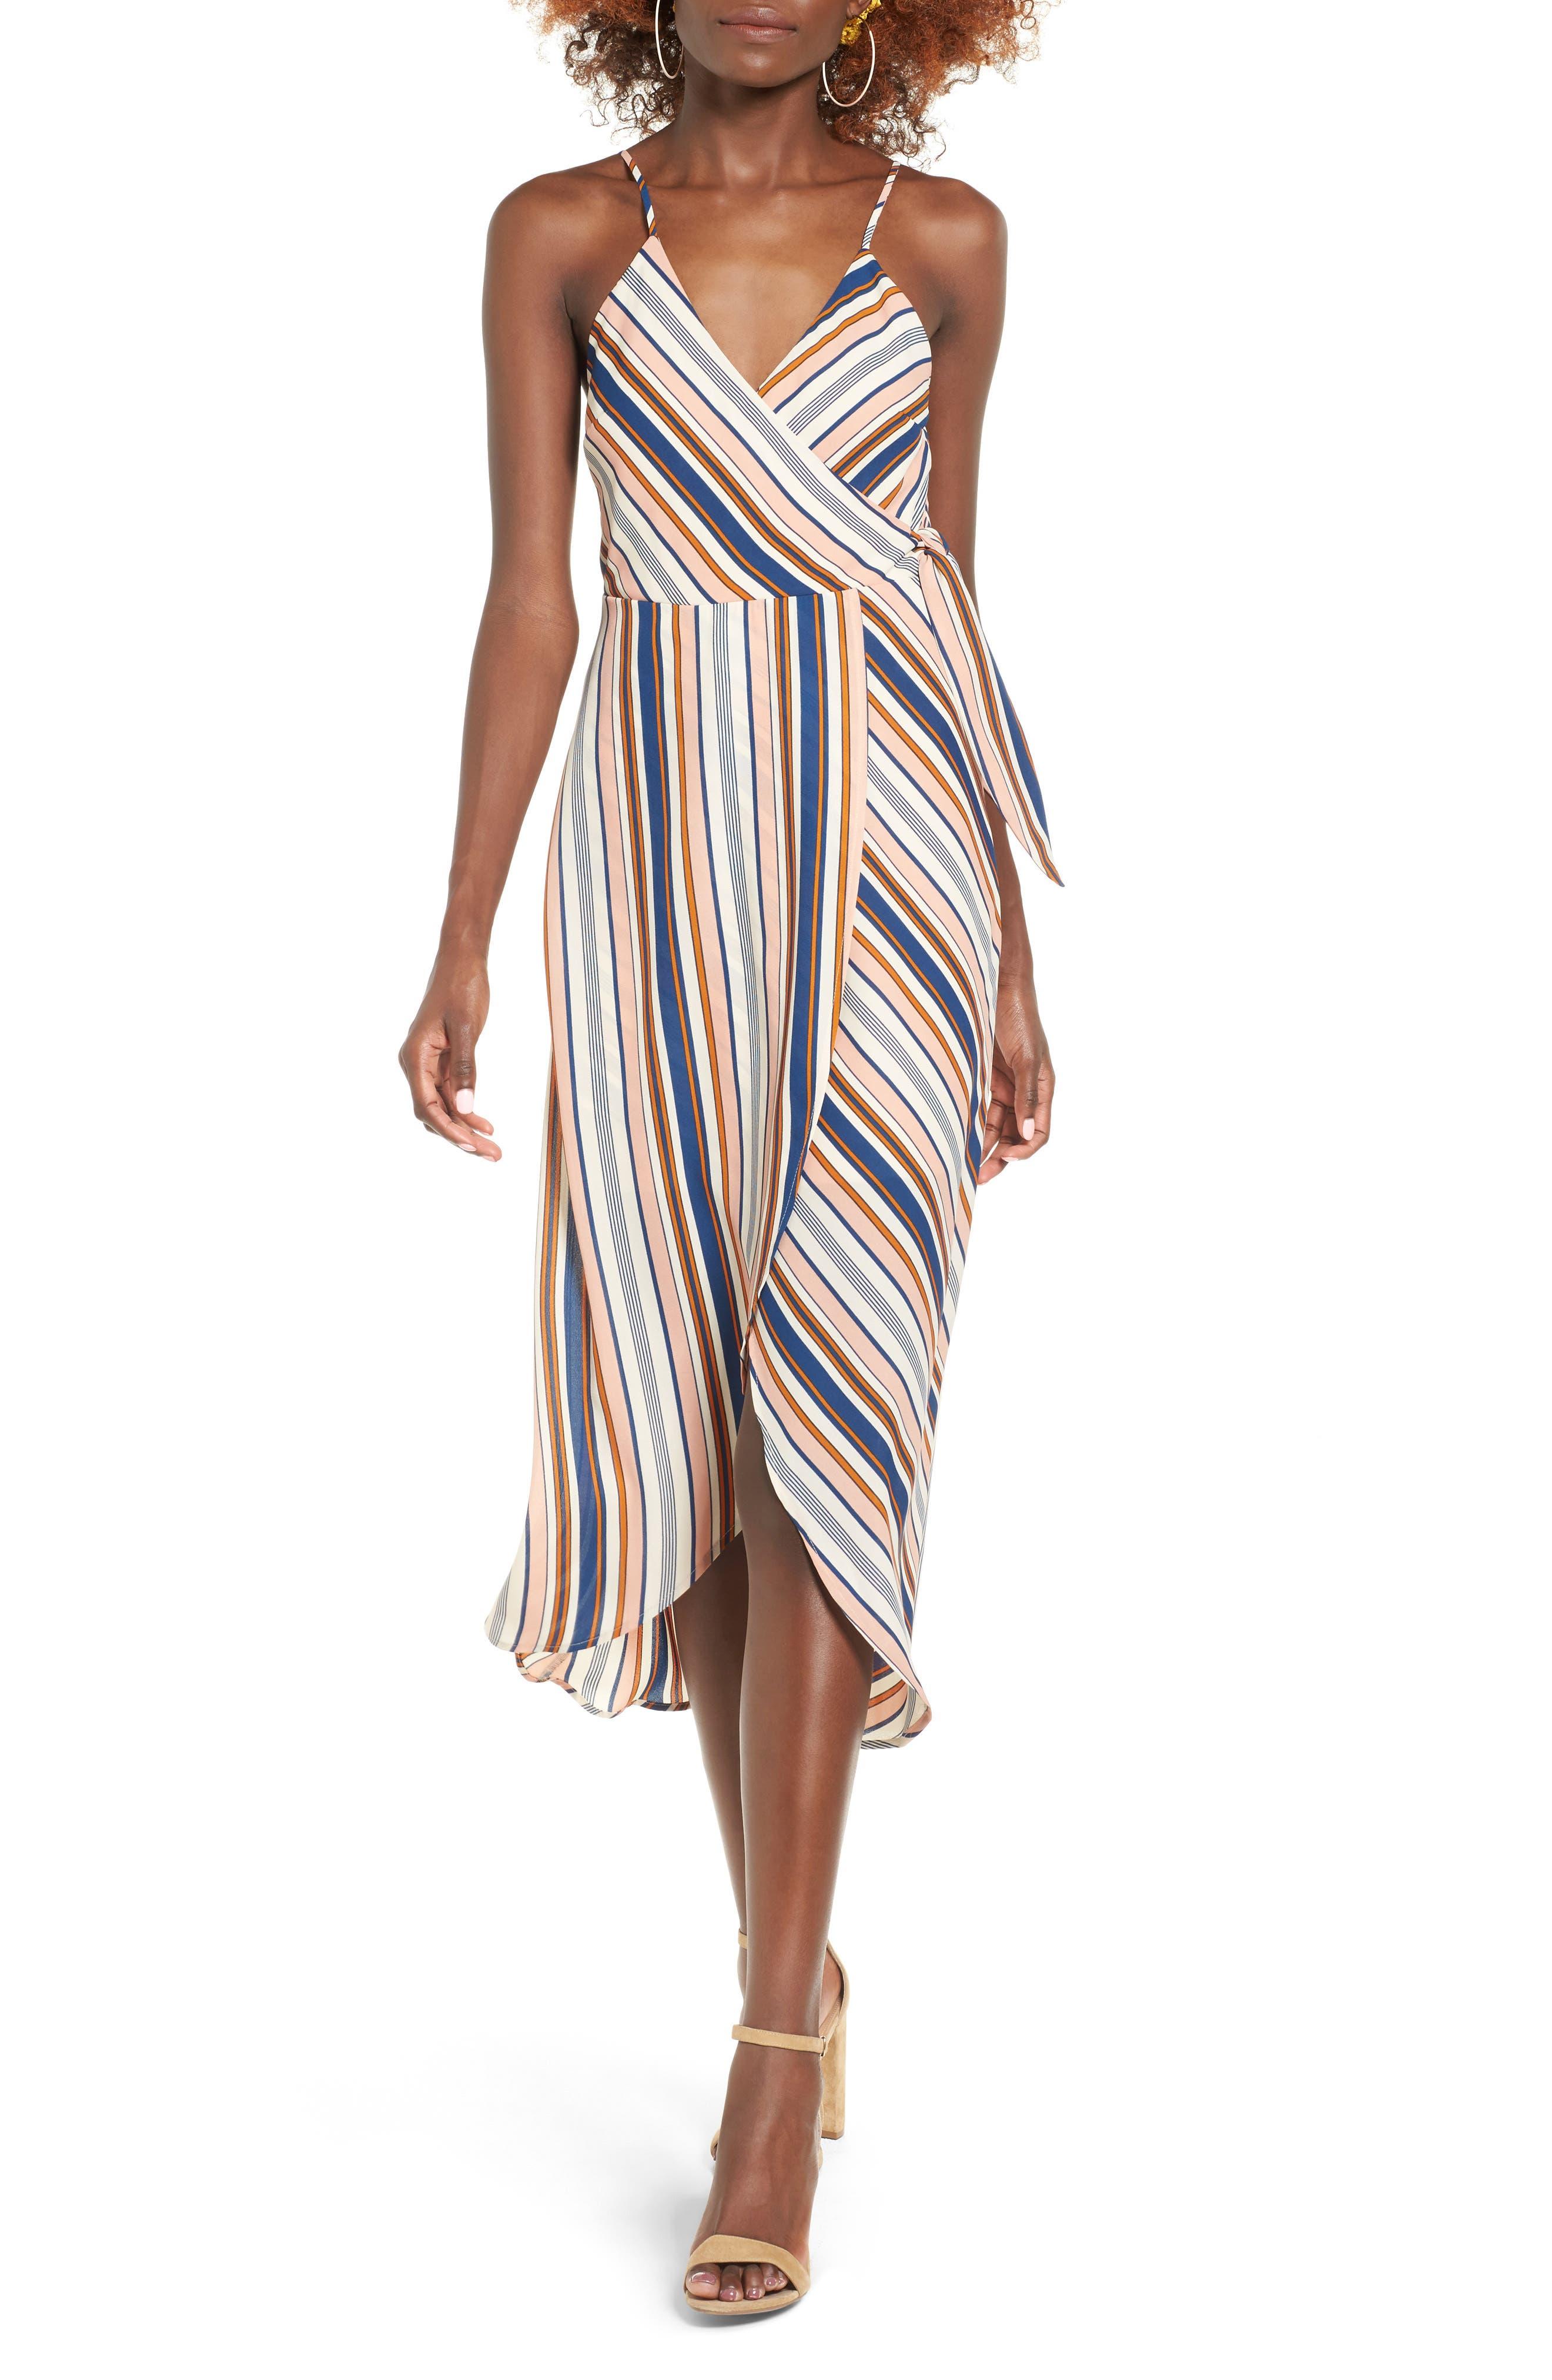 Alternate Image 1 Selected - Dee Elly Stripe Surplice Dress